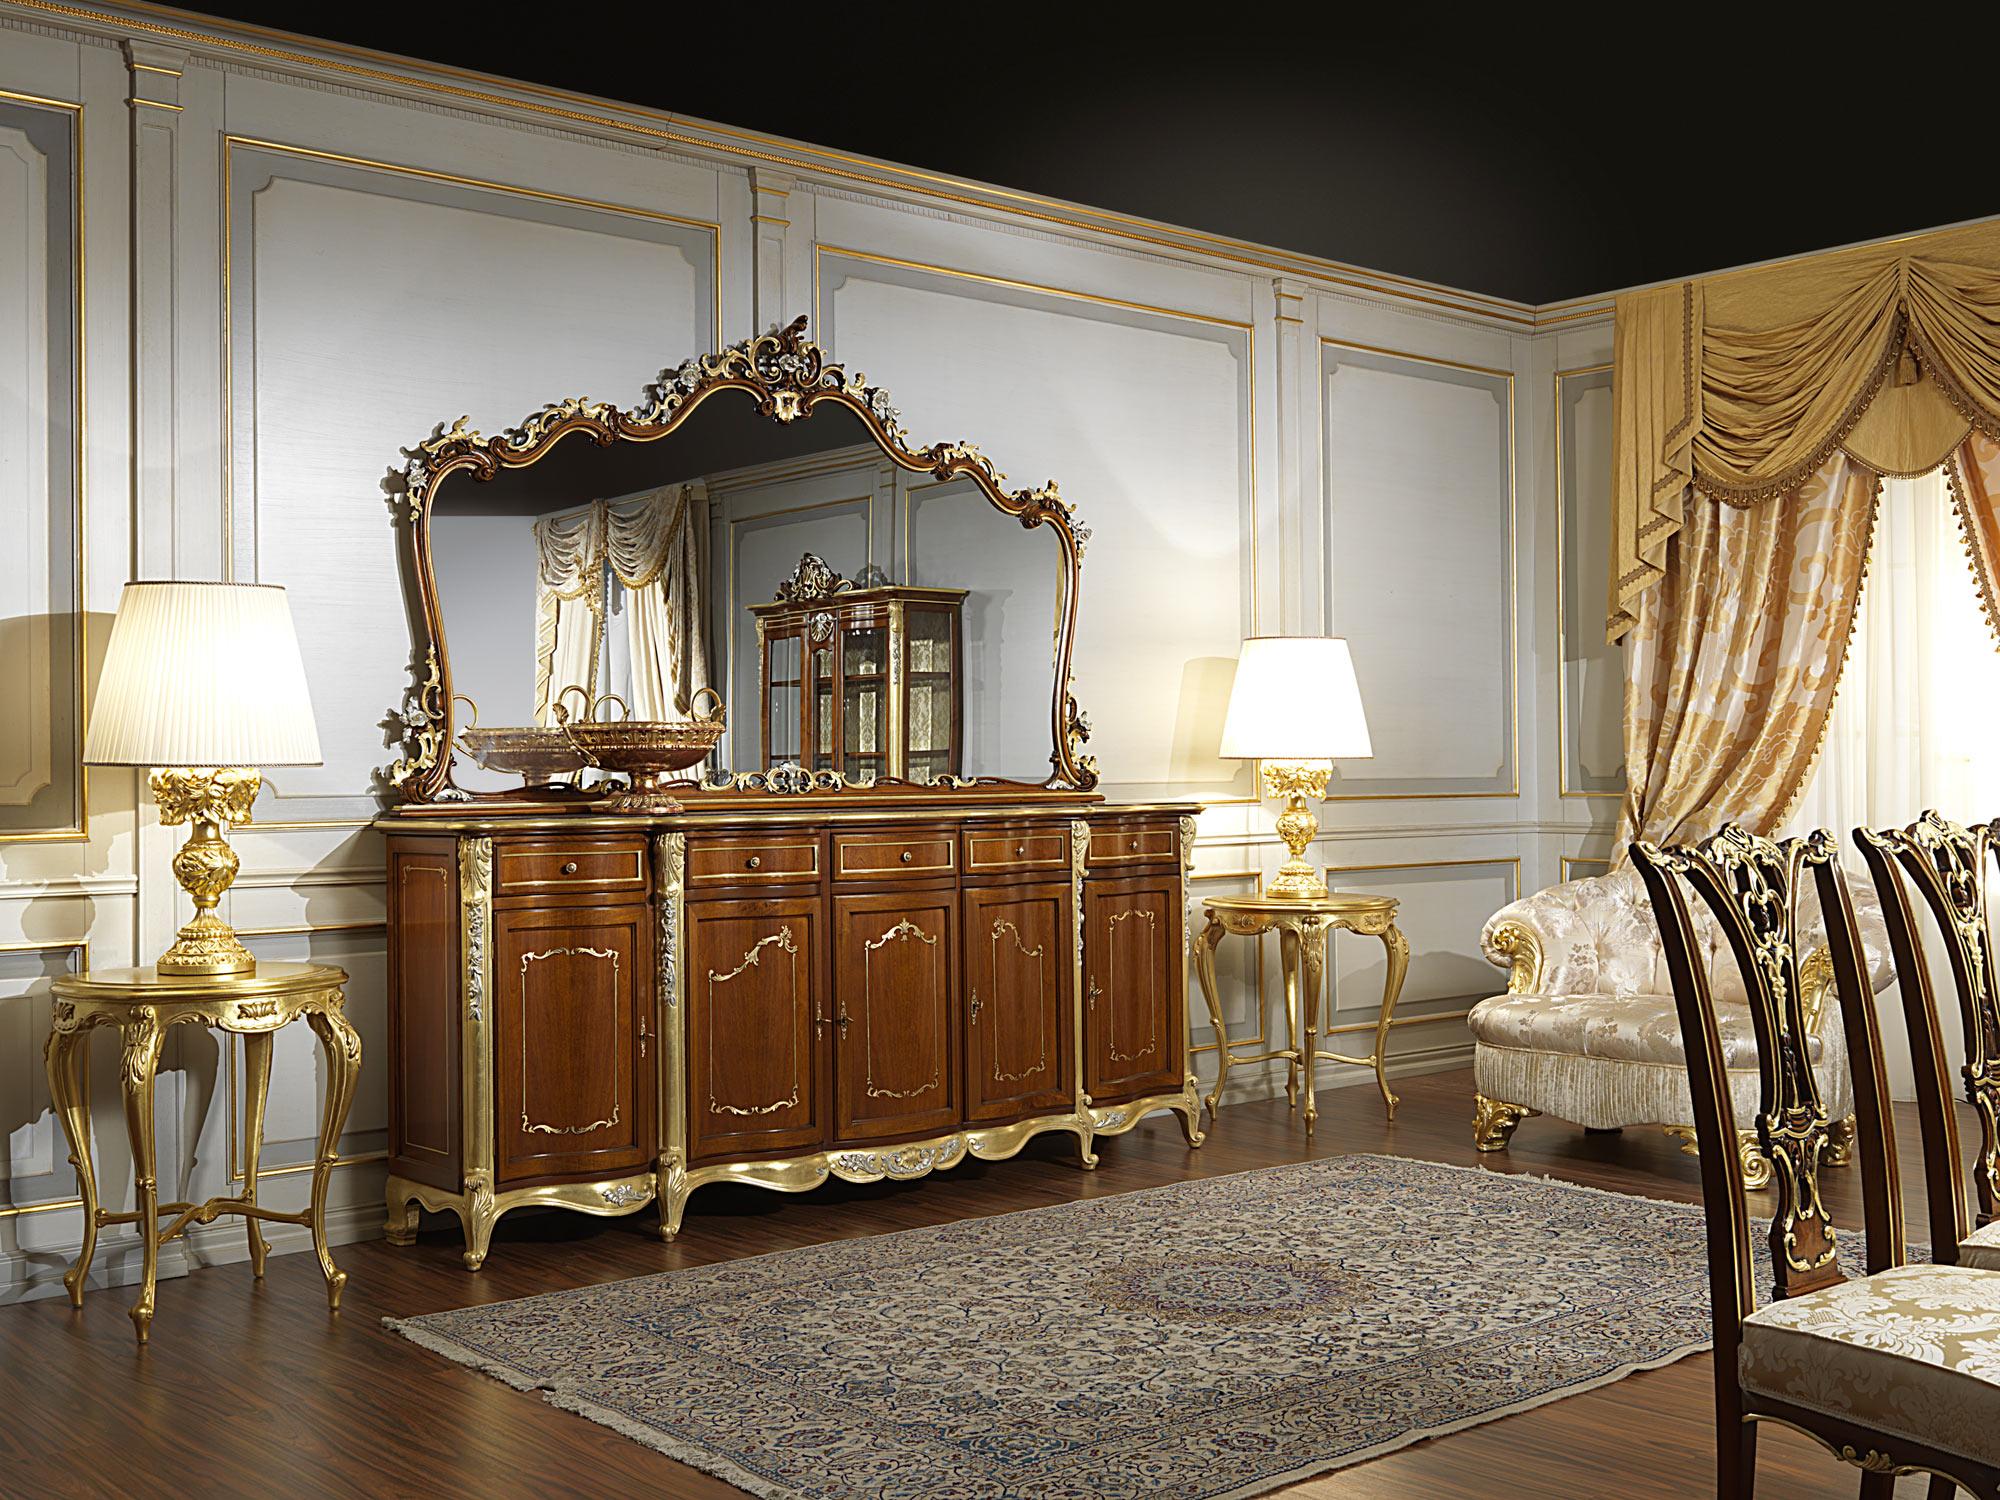 Credenza classica sala da pranzo in stile luigi xv - Credenza sala da pranzo ...